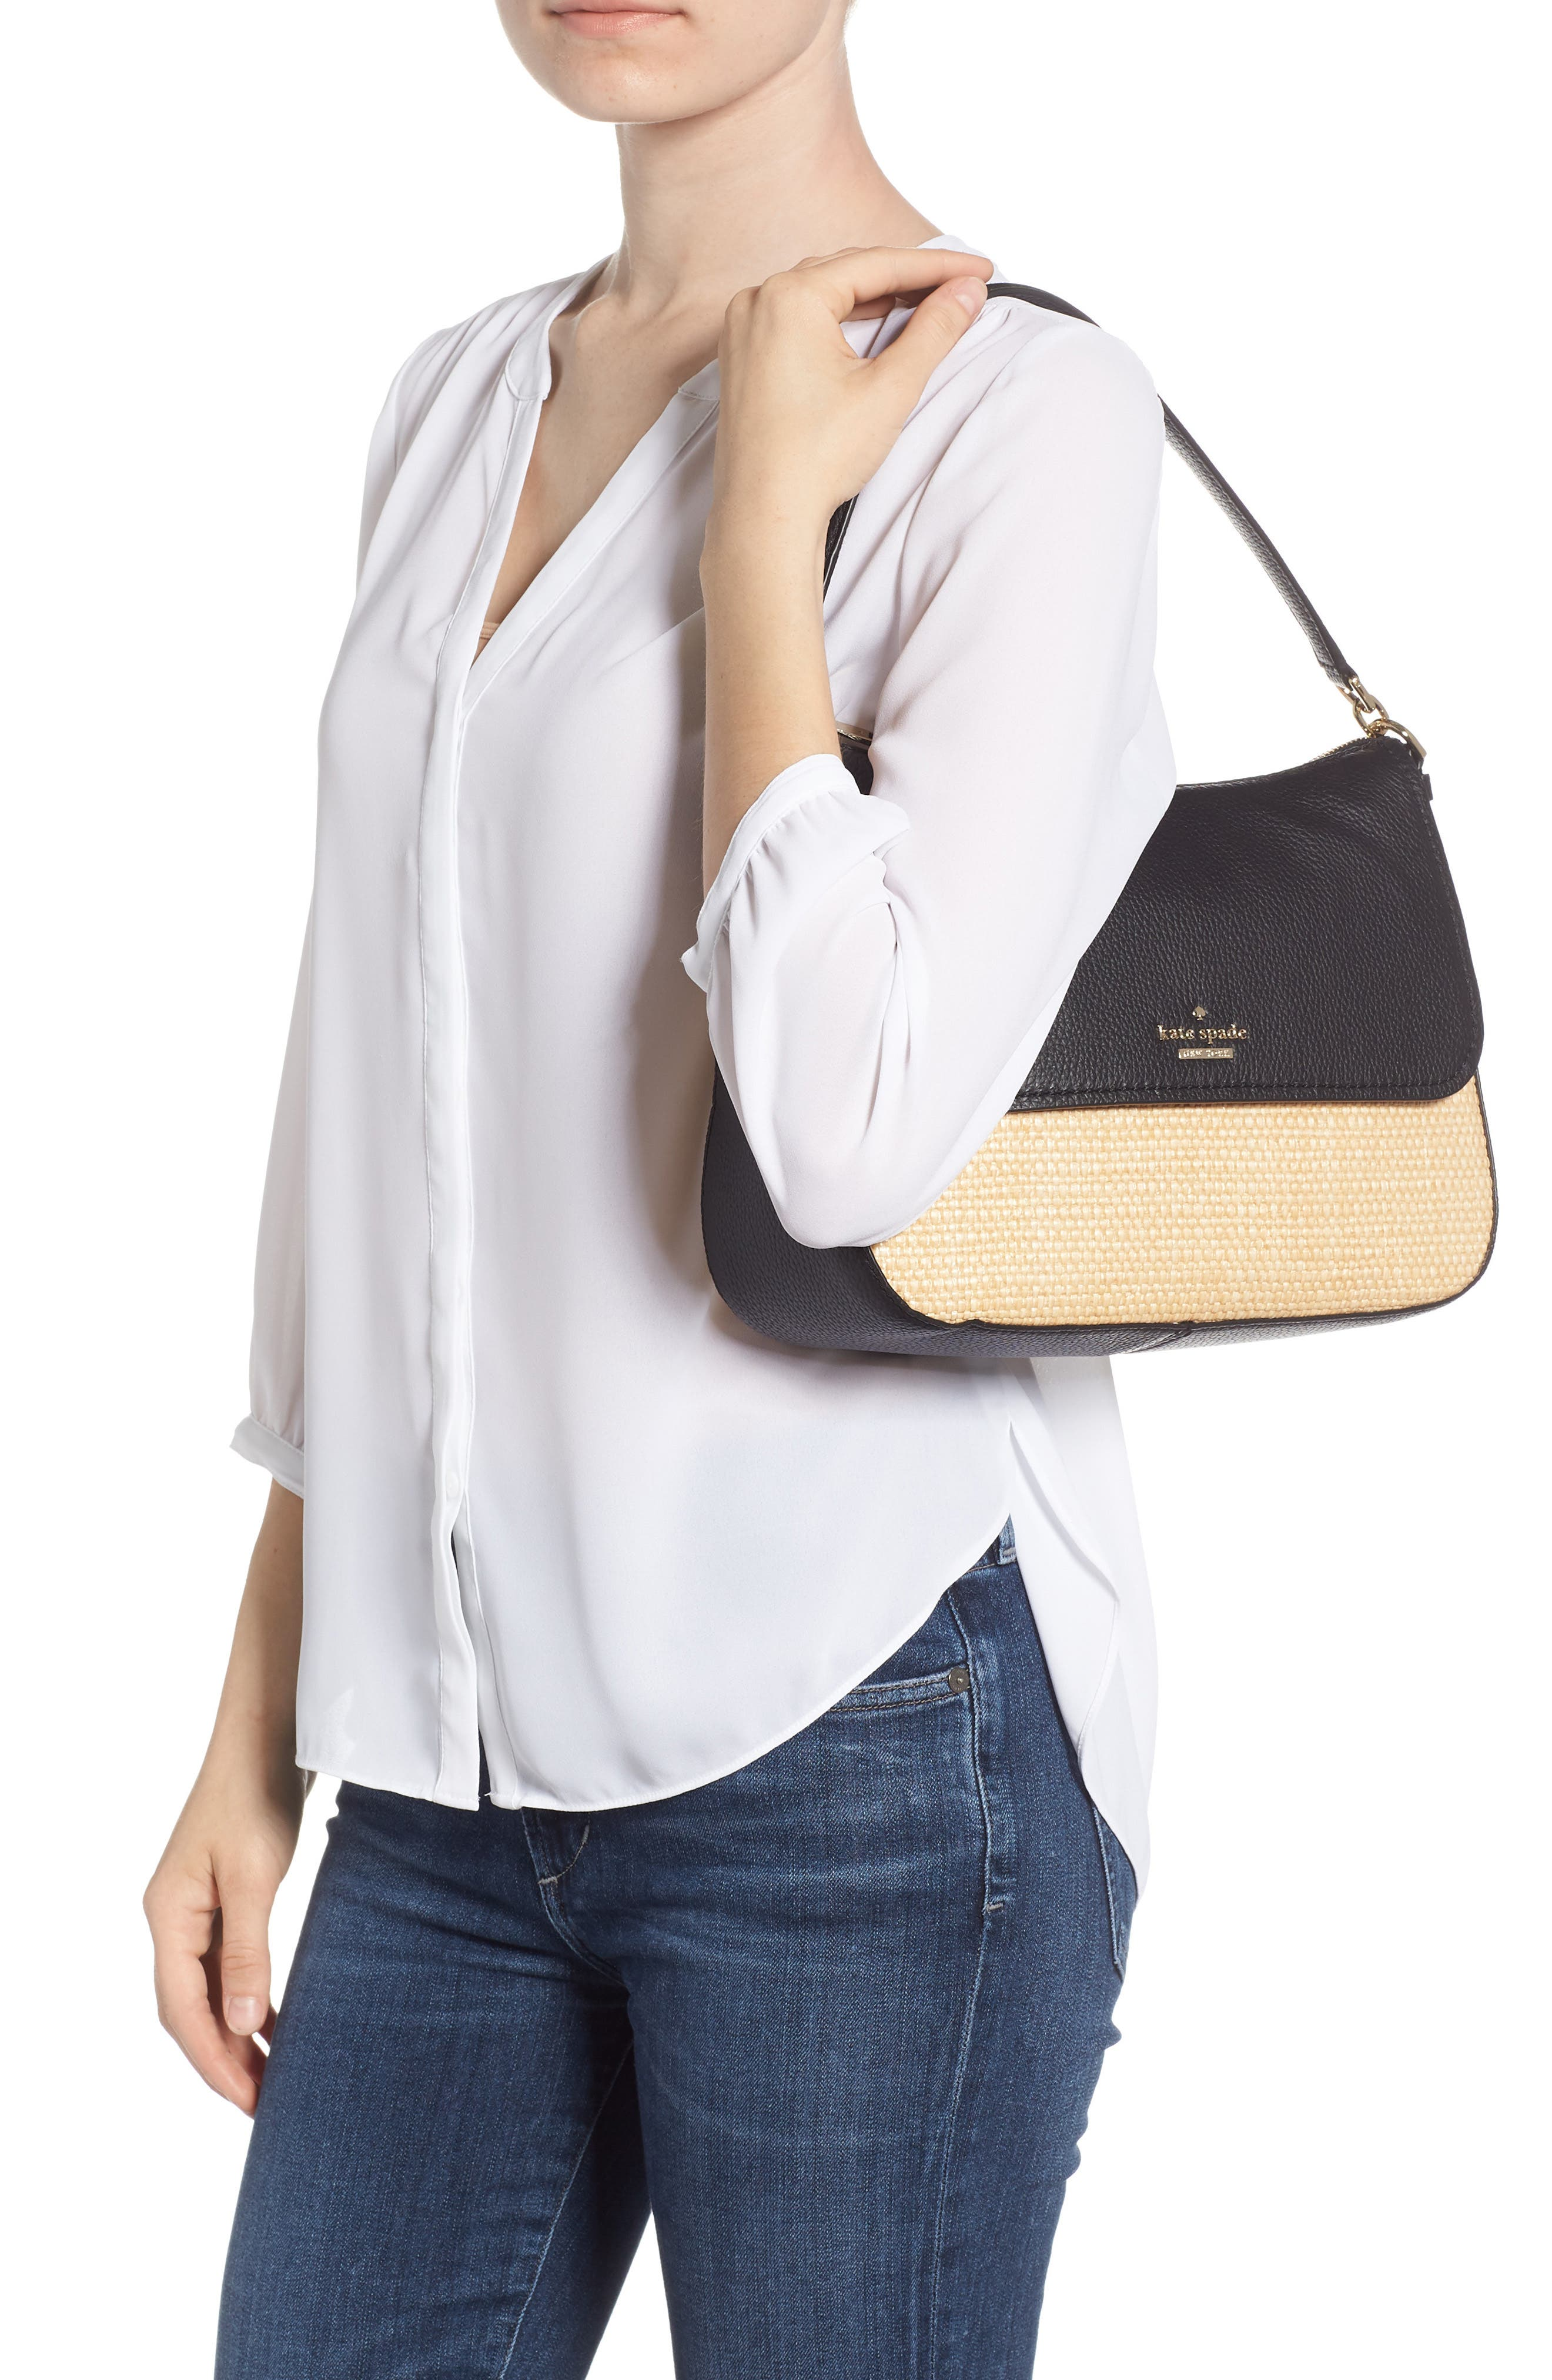 KATE SPADE NEW YORK,                             jackson street - colette straw & leather satchel,                             Alternate thumbnail 2, color,                             257